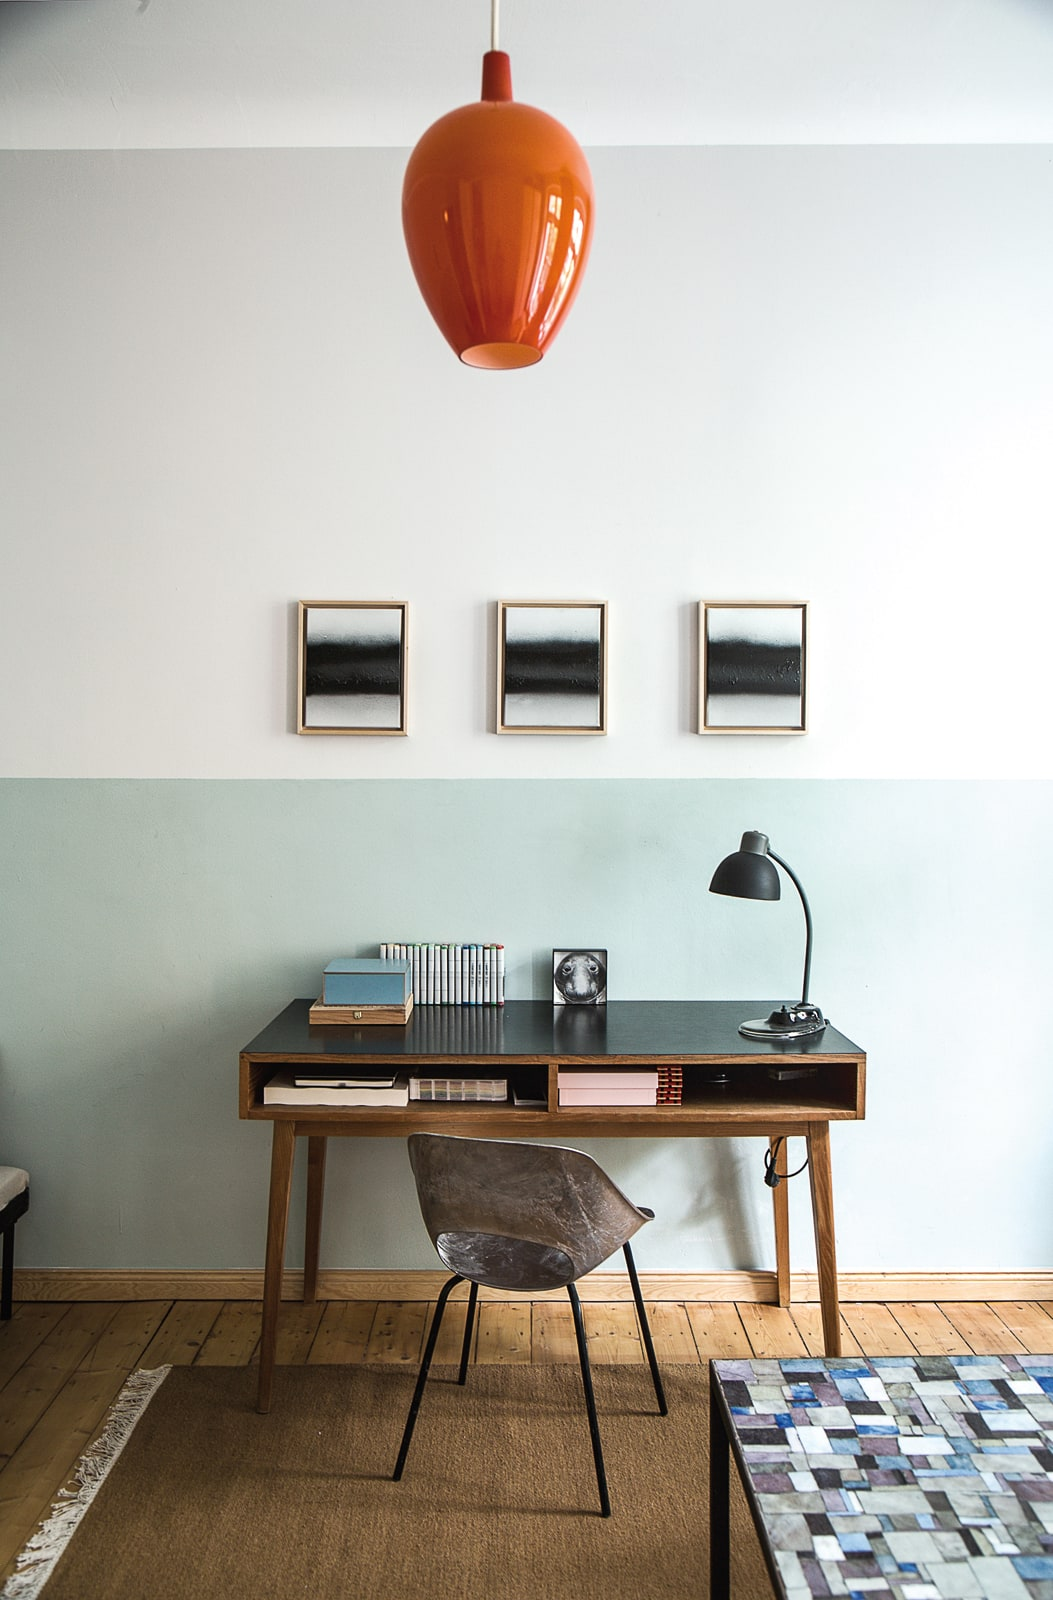 zementfliesen-terrazzofliesen-kreidefarbe-Eisblau-terrazzo-fugenlos-viaplatten-vintagency-sockel | Kreidefarbe Eisblau 2500 ml